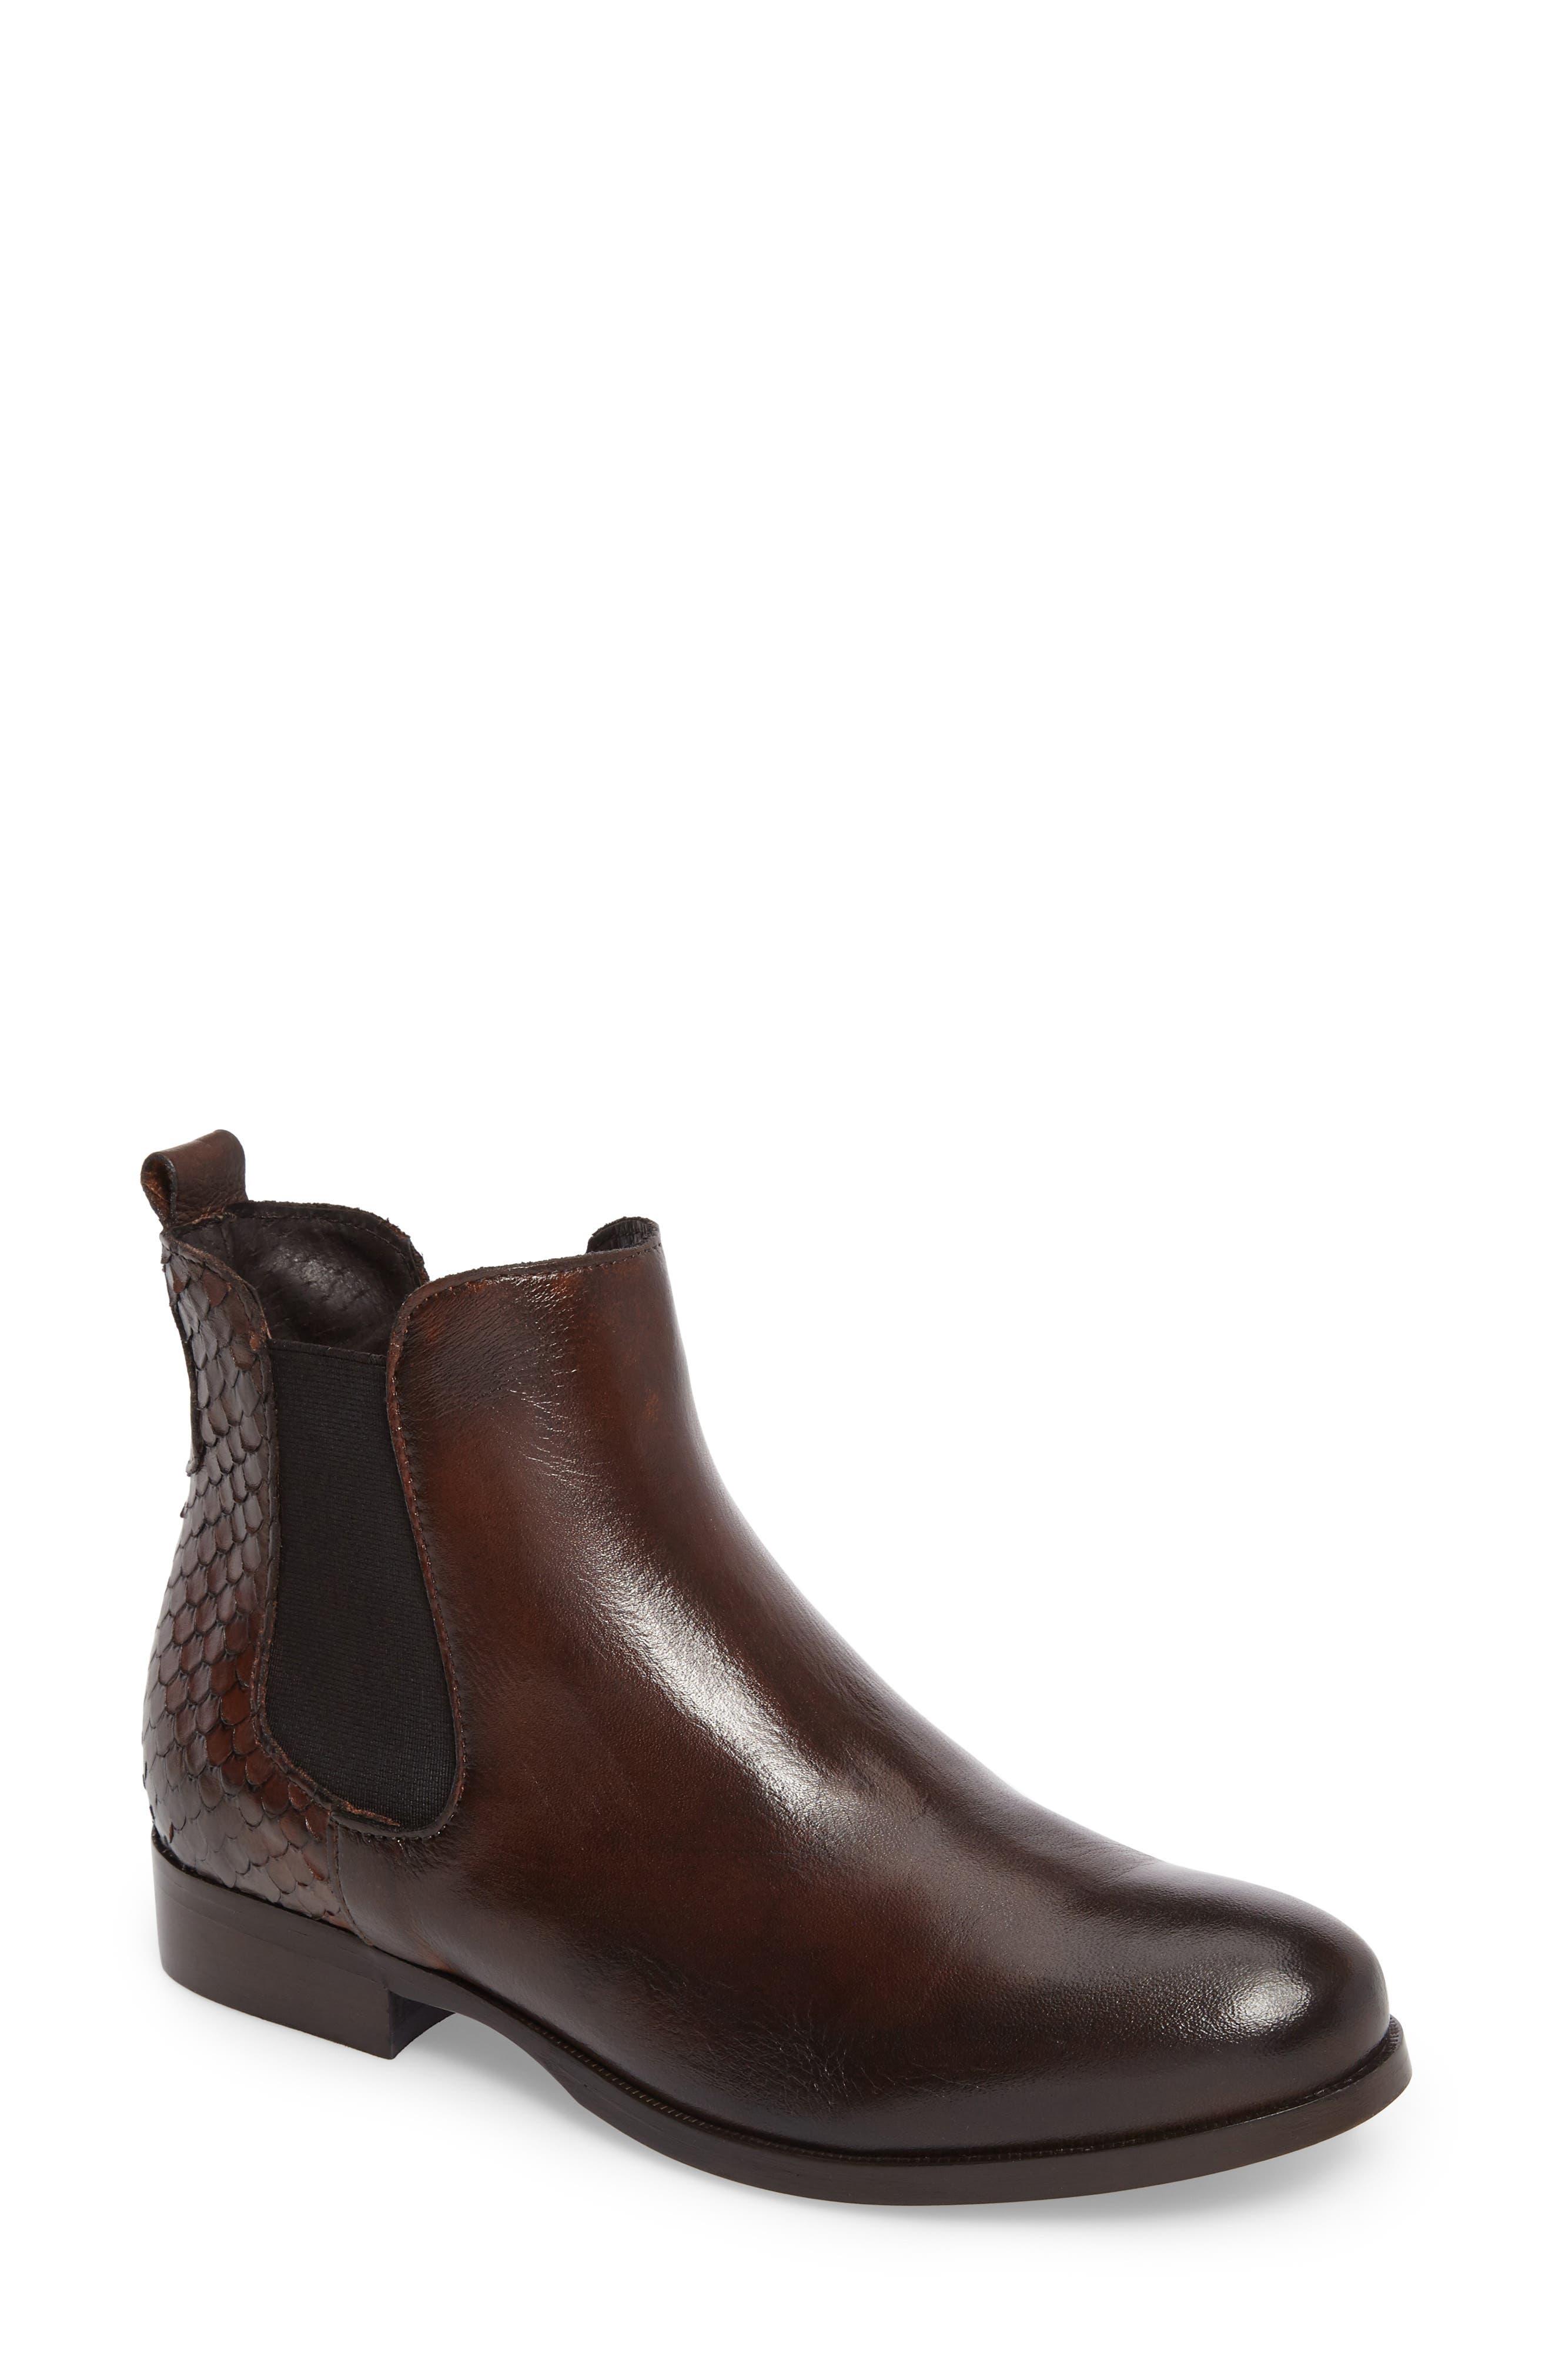 Padamae Water Resistant Chelsea Boot,                         Main,                         color, Onyx Suede